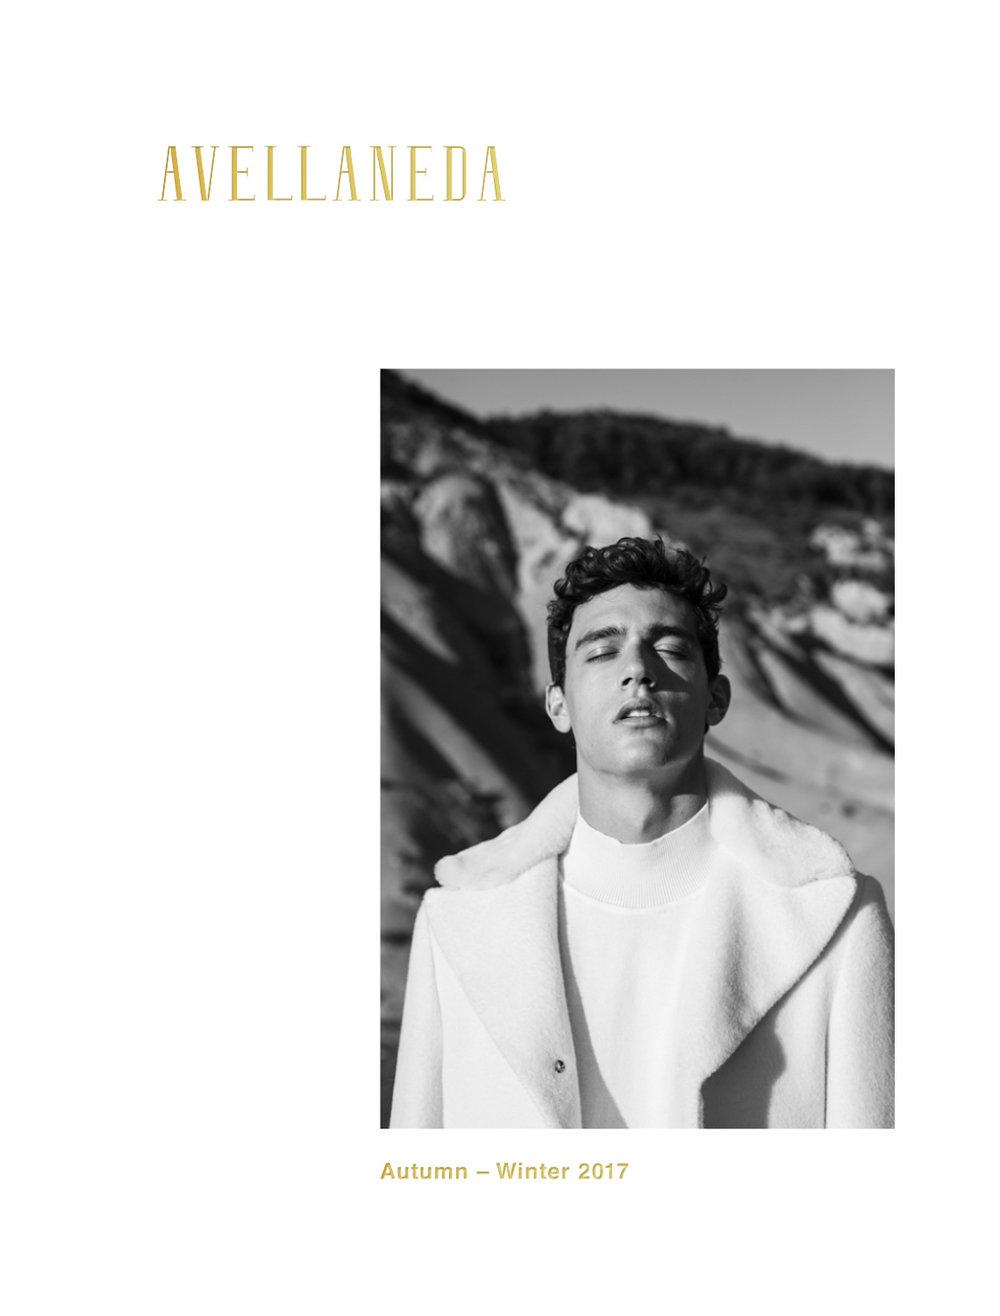 Avellaneda